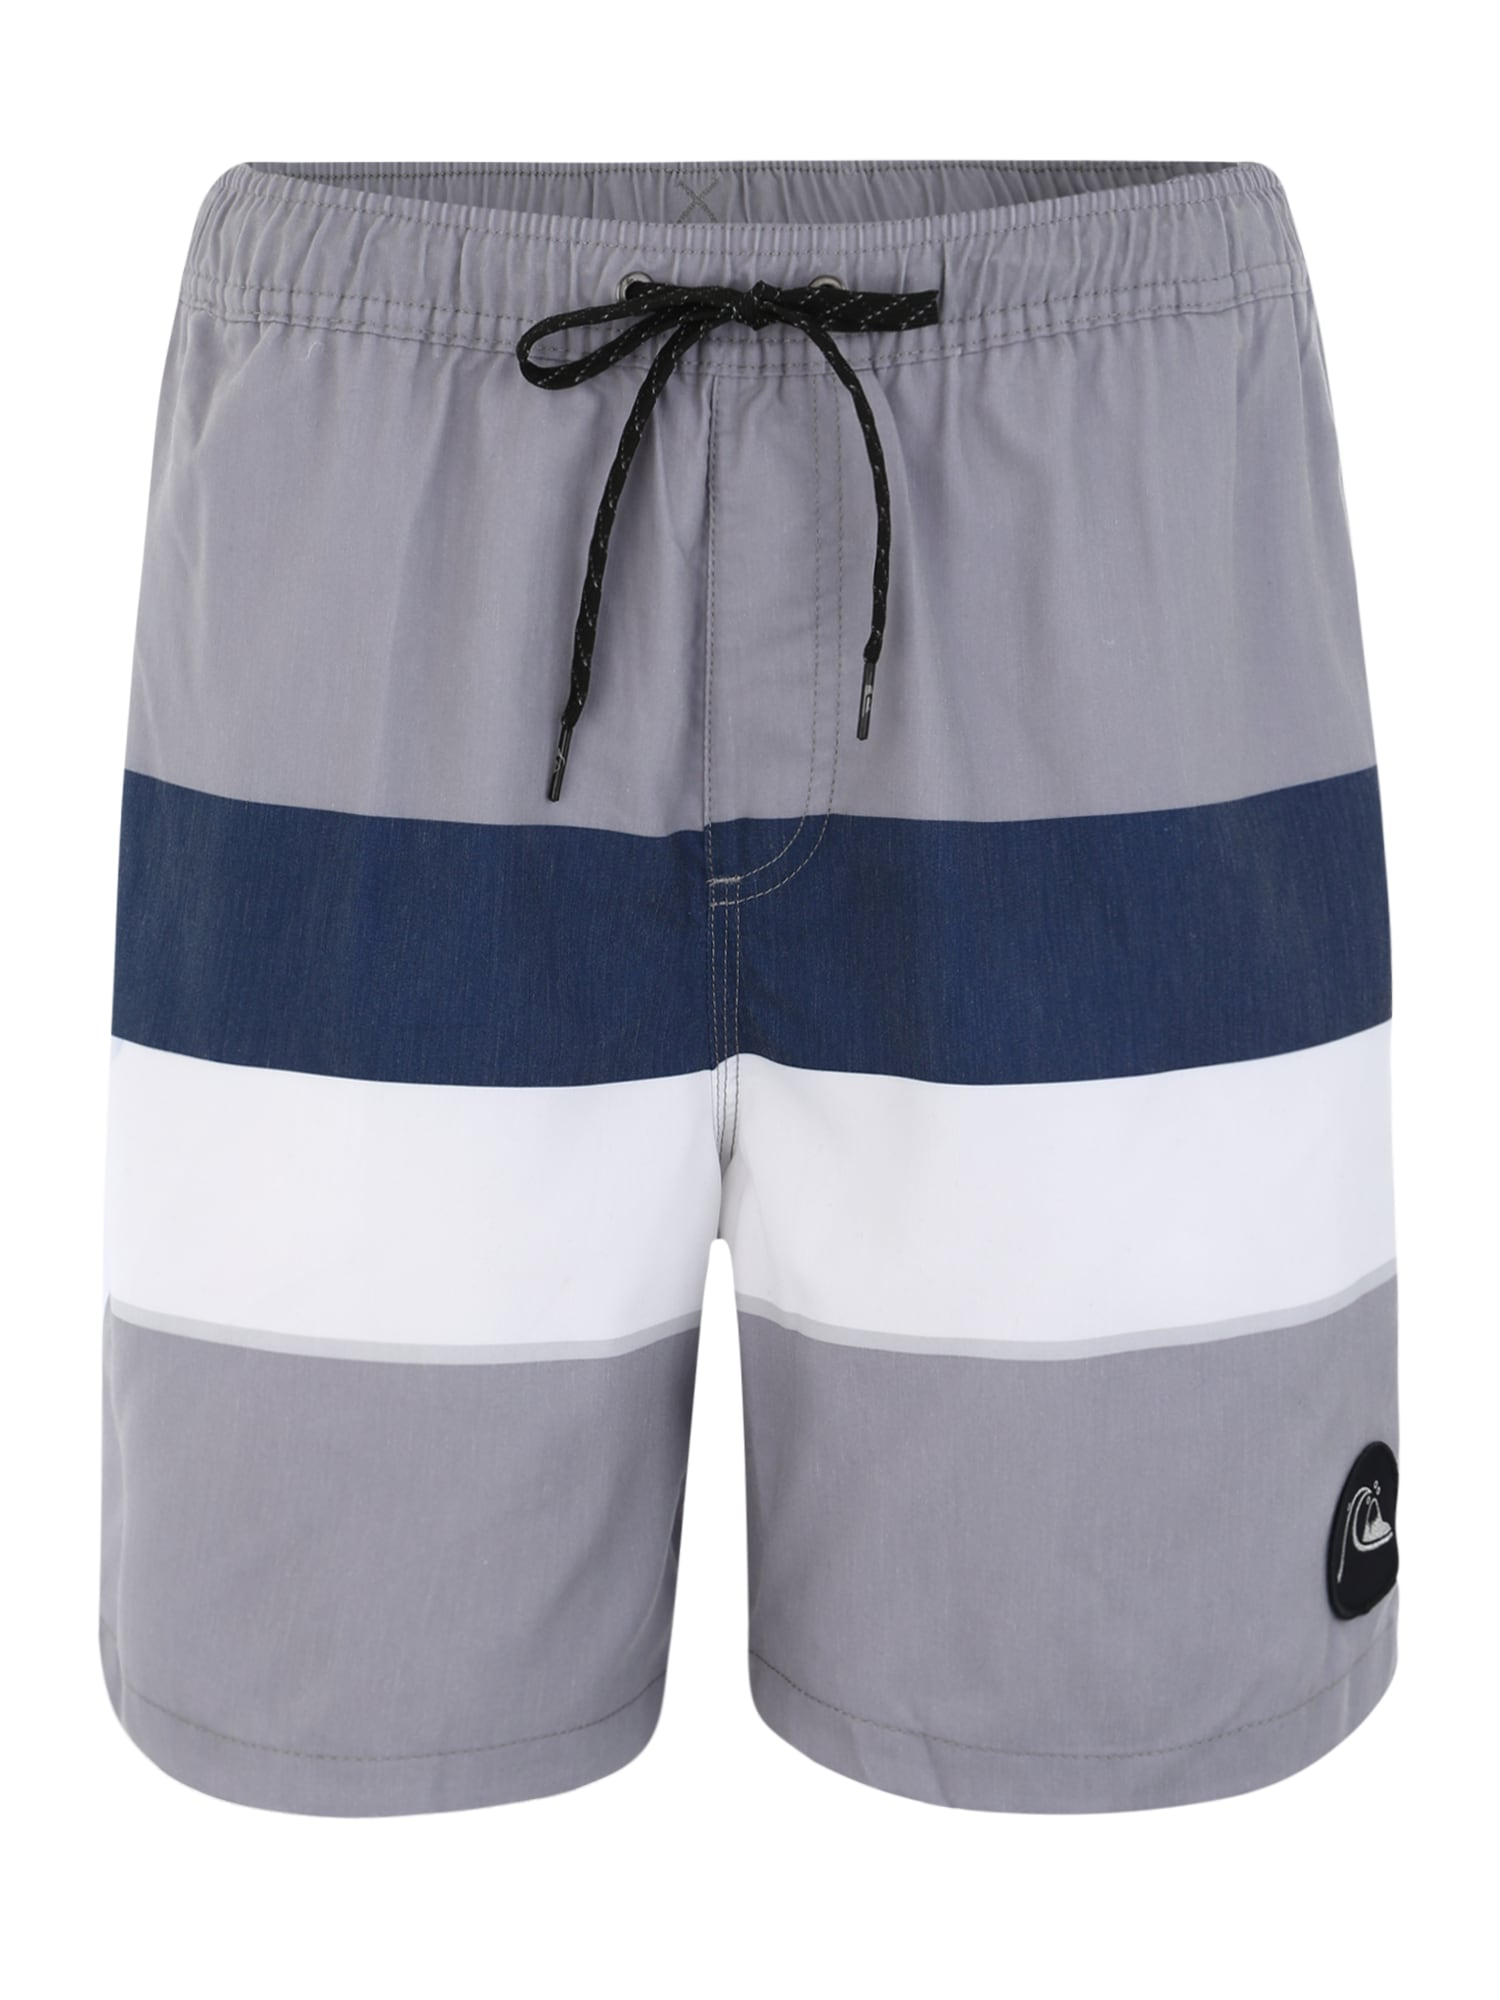 Plavecké šortky SEASONSVOL17 M JAMV tmavě modrá světle šedá bílá QUIKSILVER